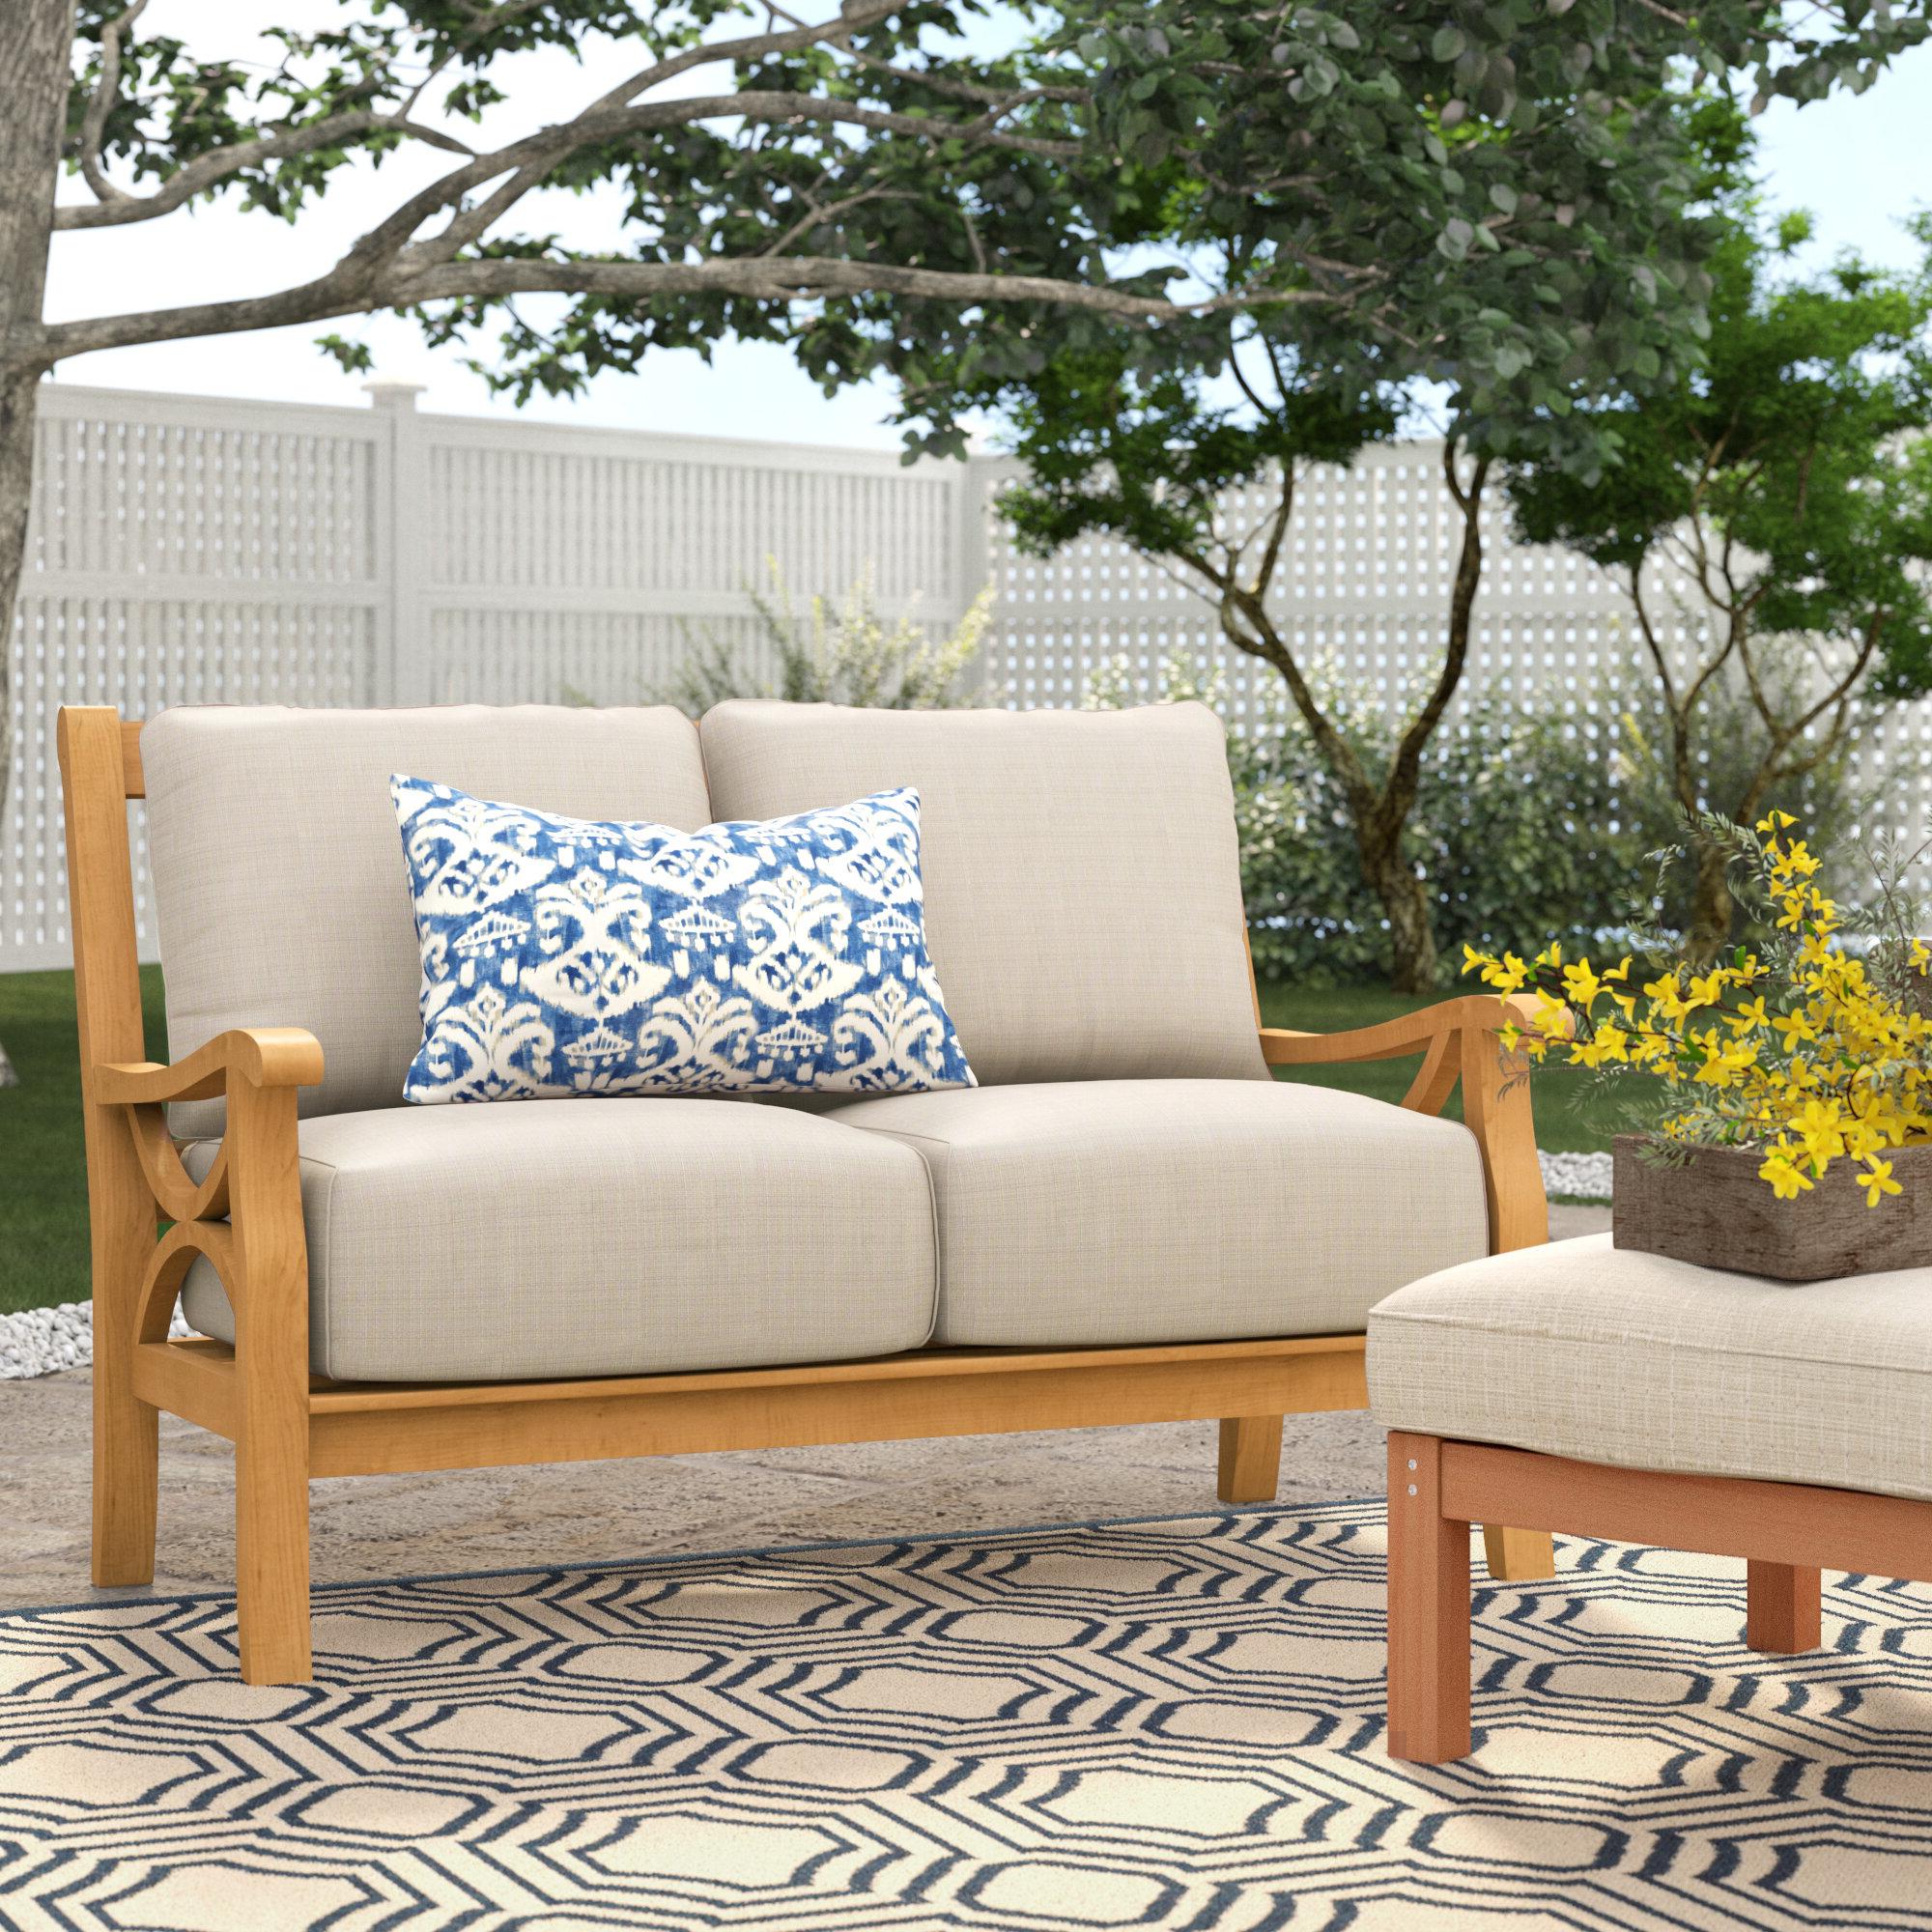 Featured Photo of Brunswick Teak Loveseats With Cushions